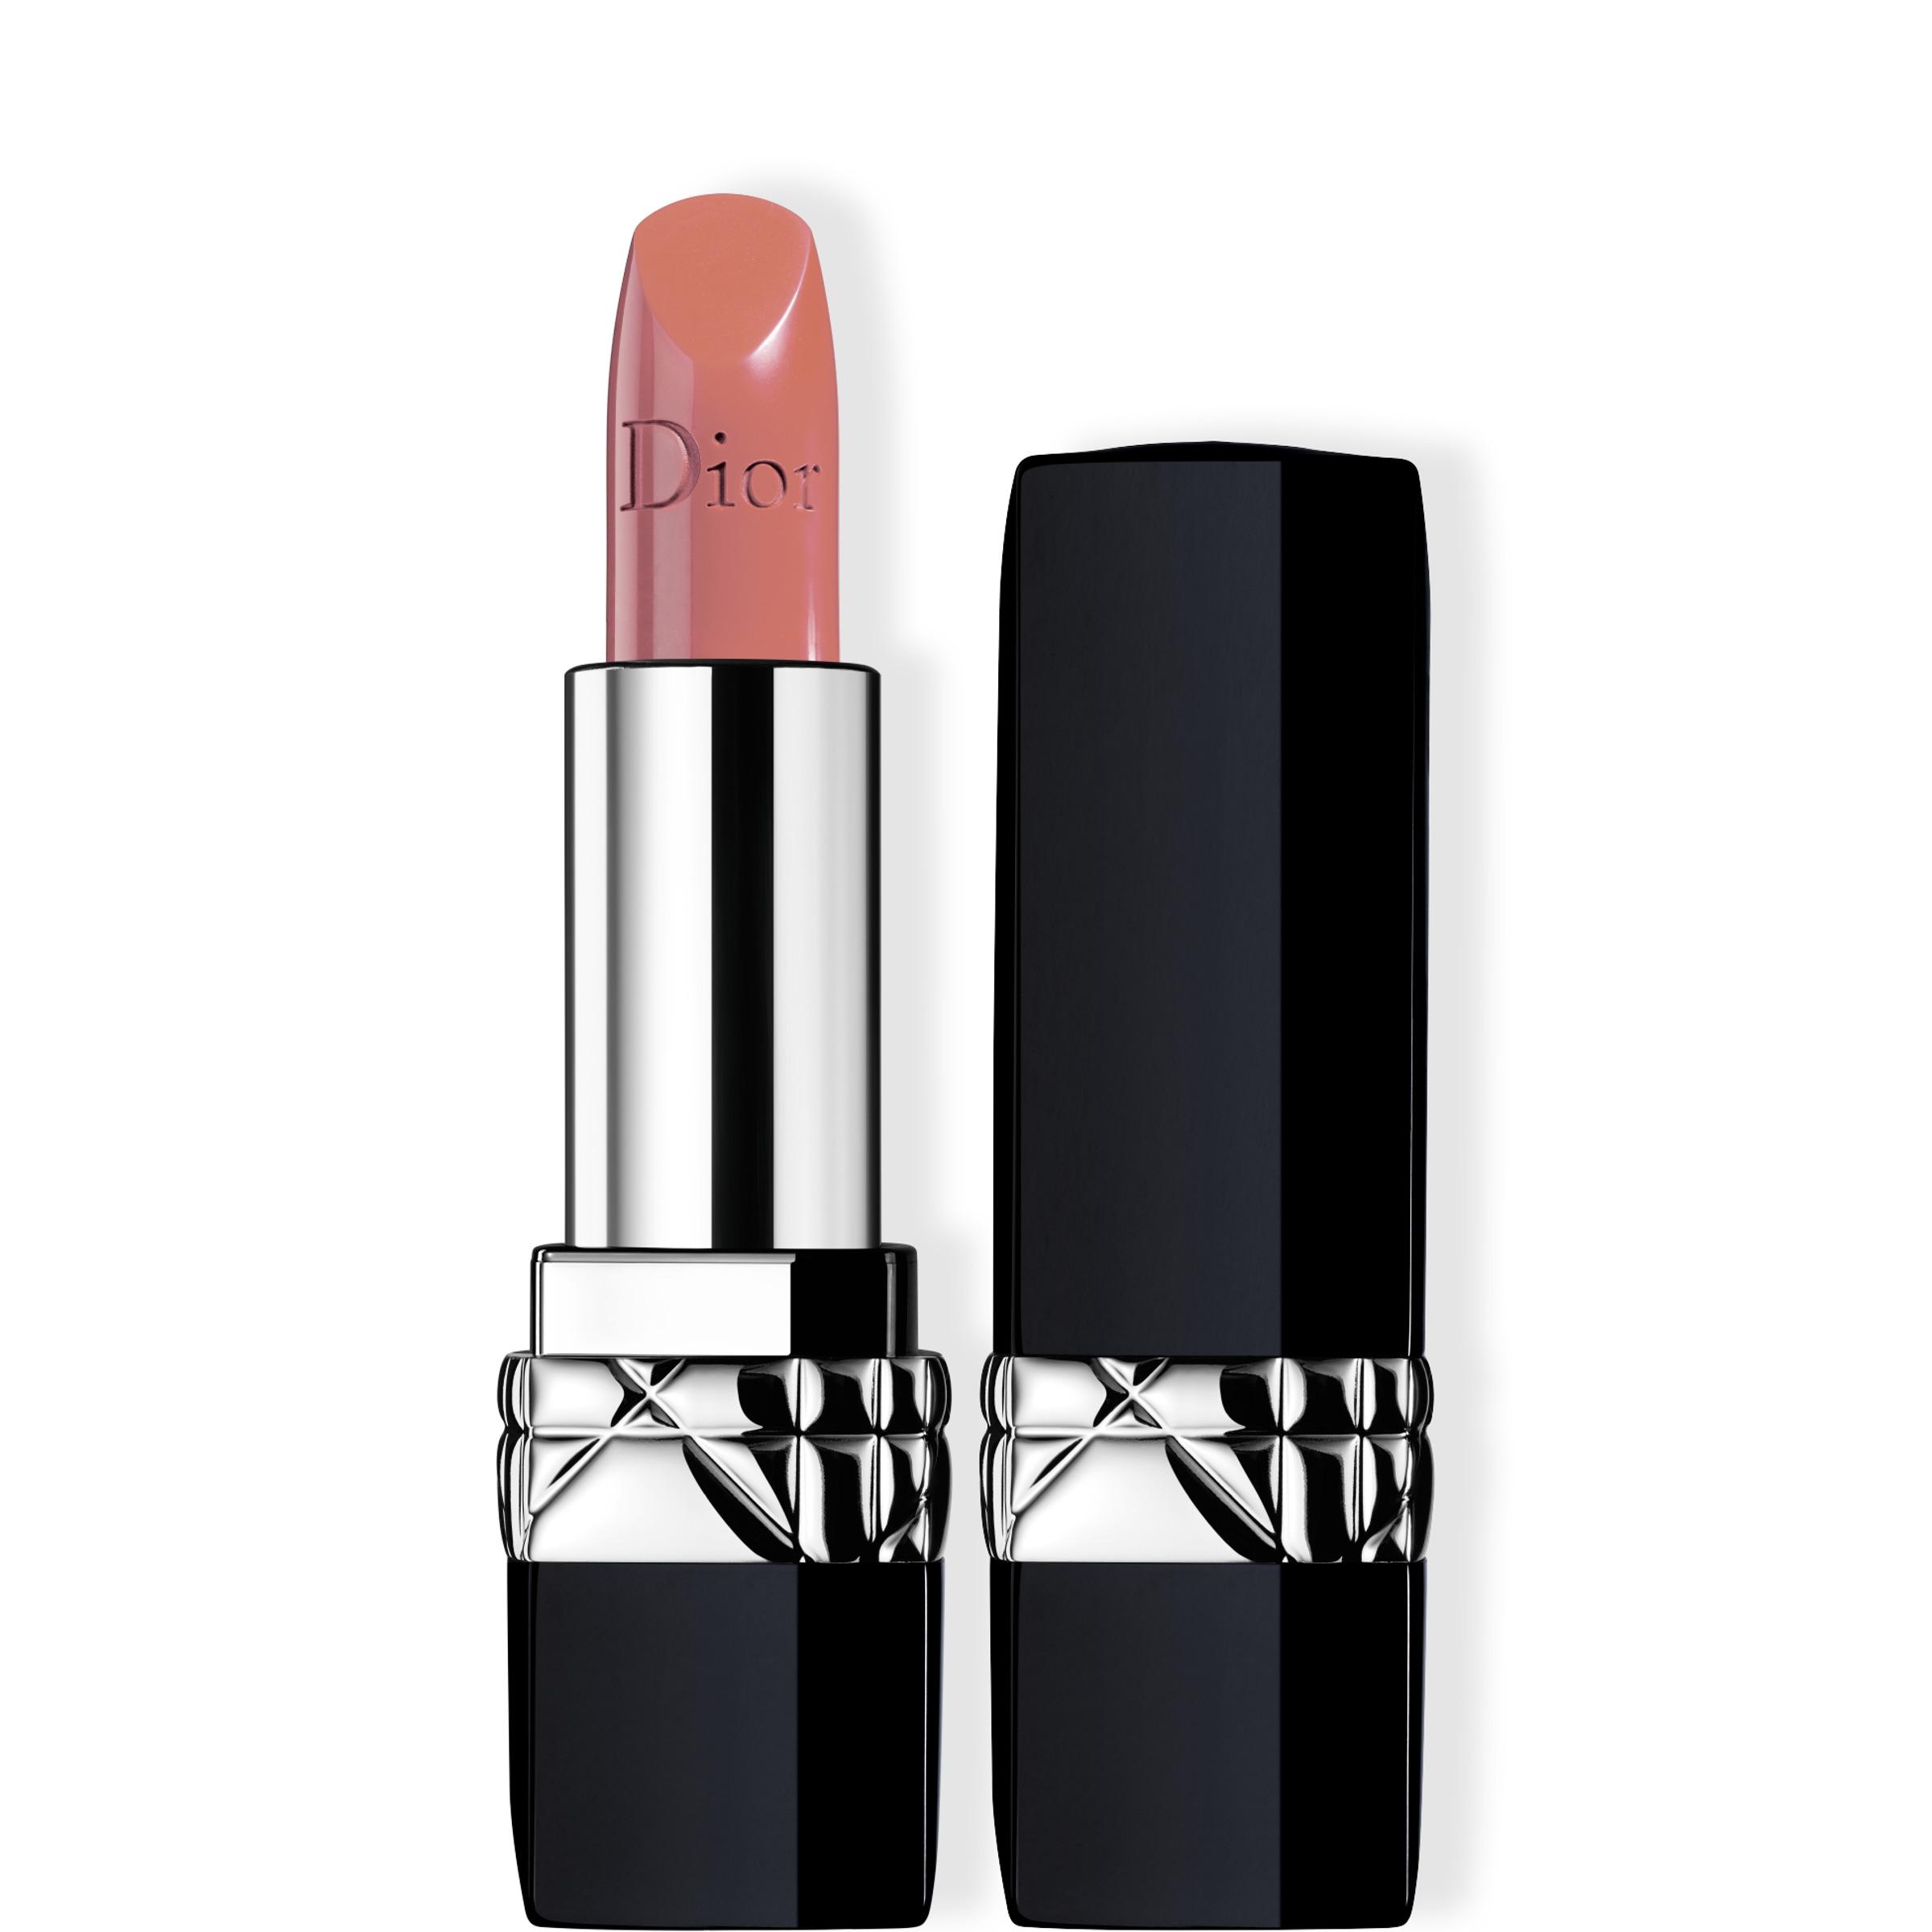 Rouge Dior Lipstick 219 Rose Montaigne